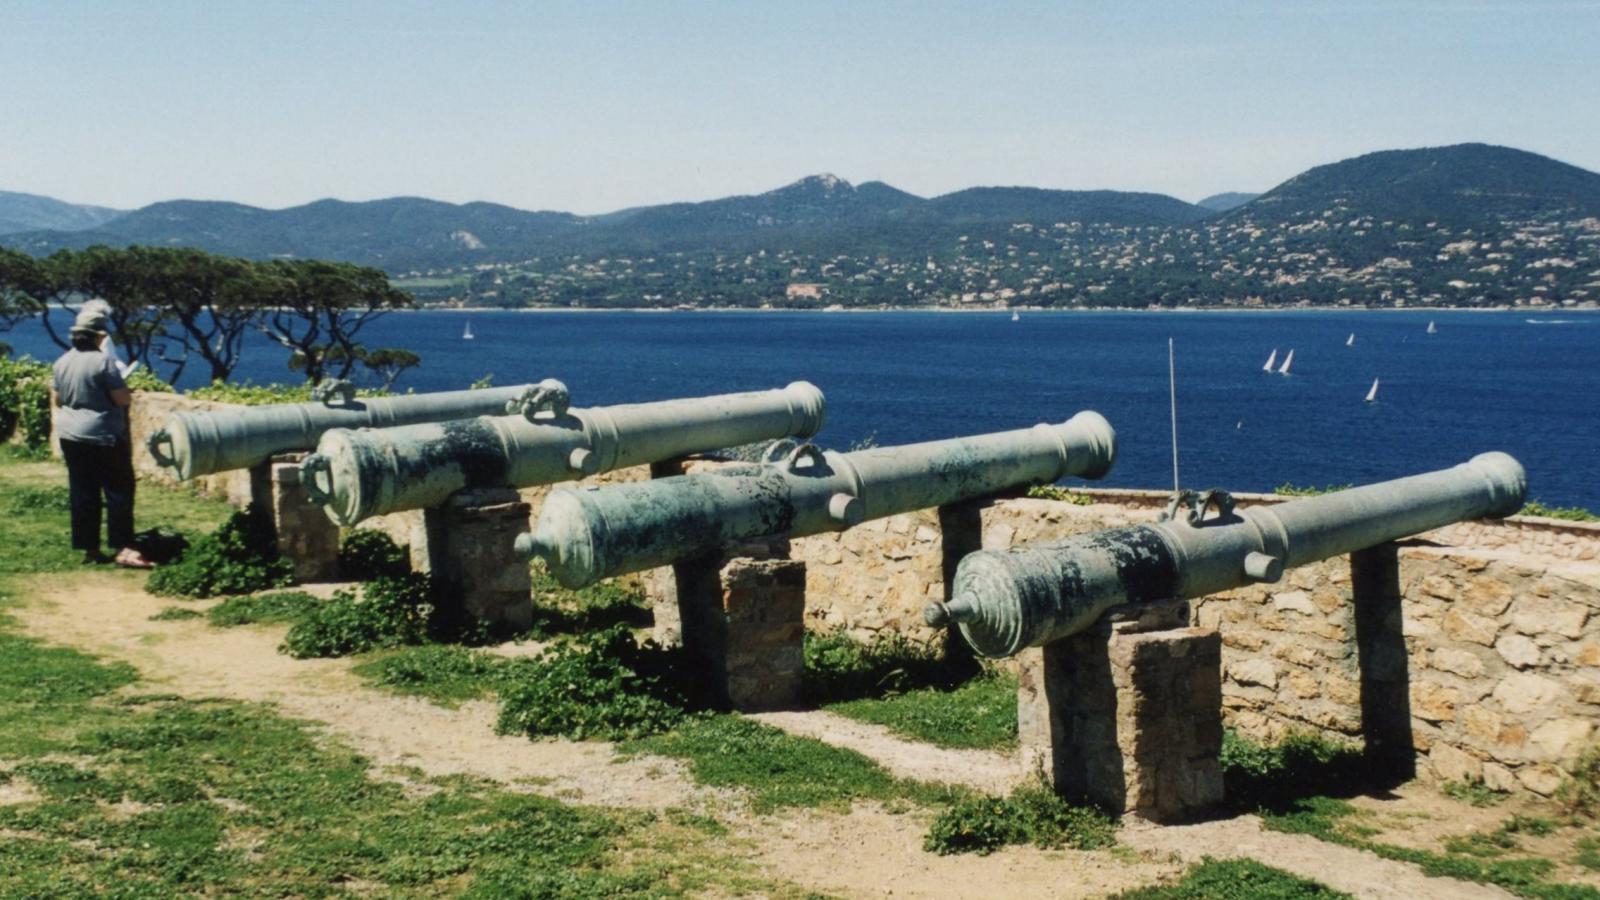 Saint-Tropez: a long maritime history